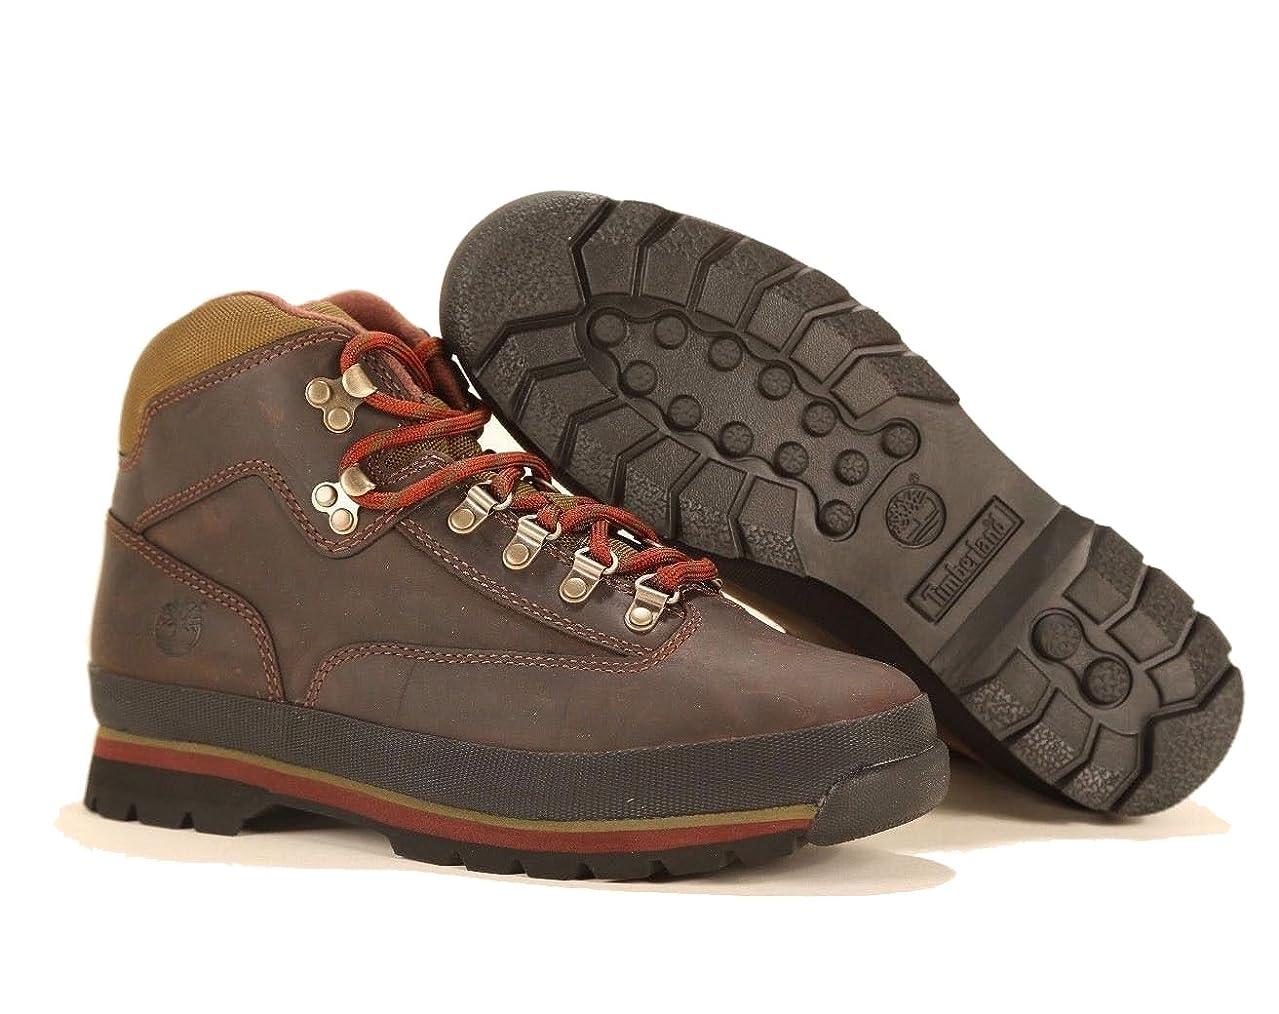 Timberland Mens Euro Hiker Boots (9.5)